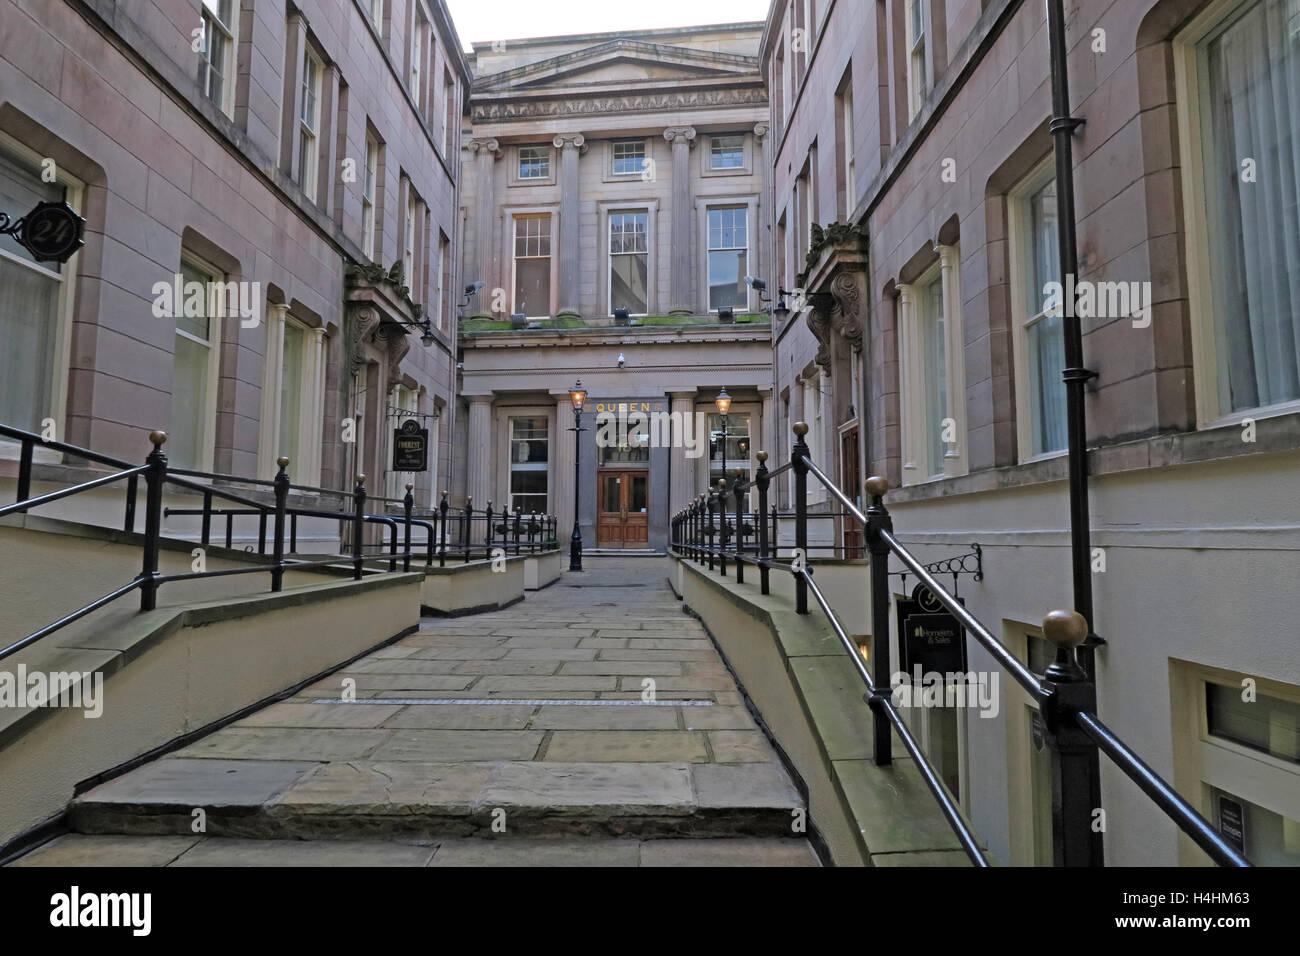 Queen Insurance Buildings,Queen avenue,Castle St,Liverpool,England,UK - Stock Image